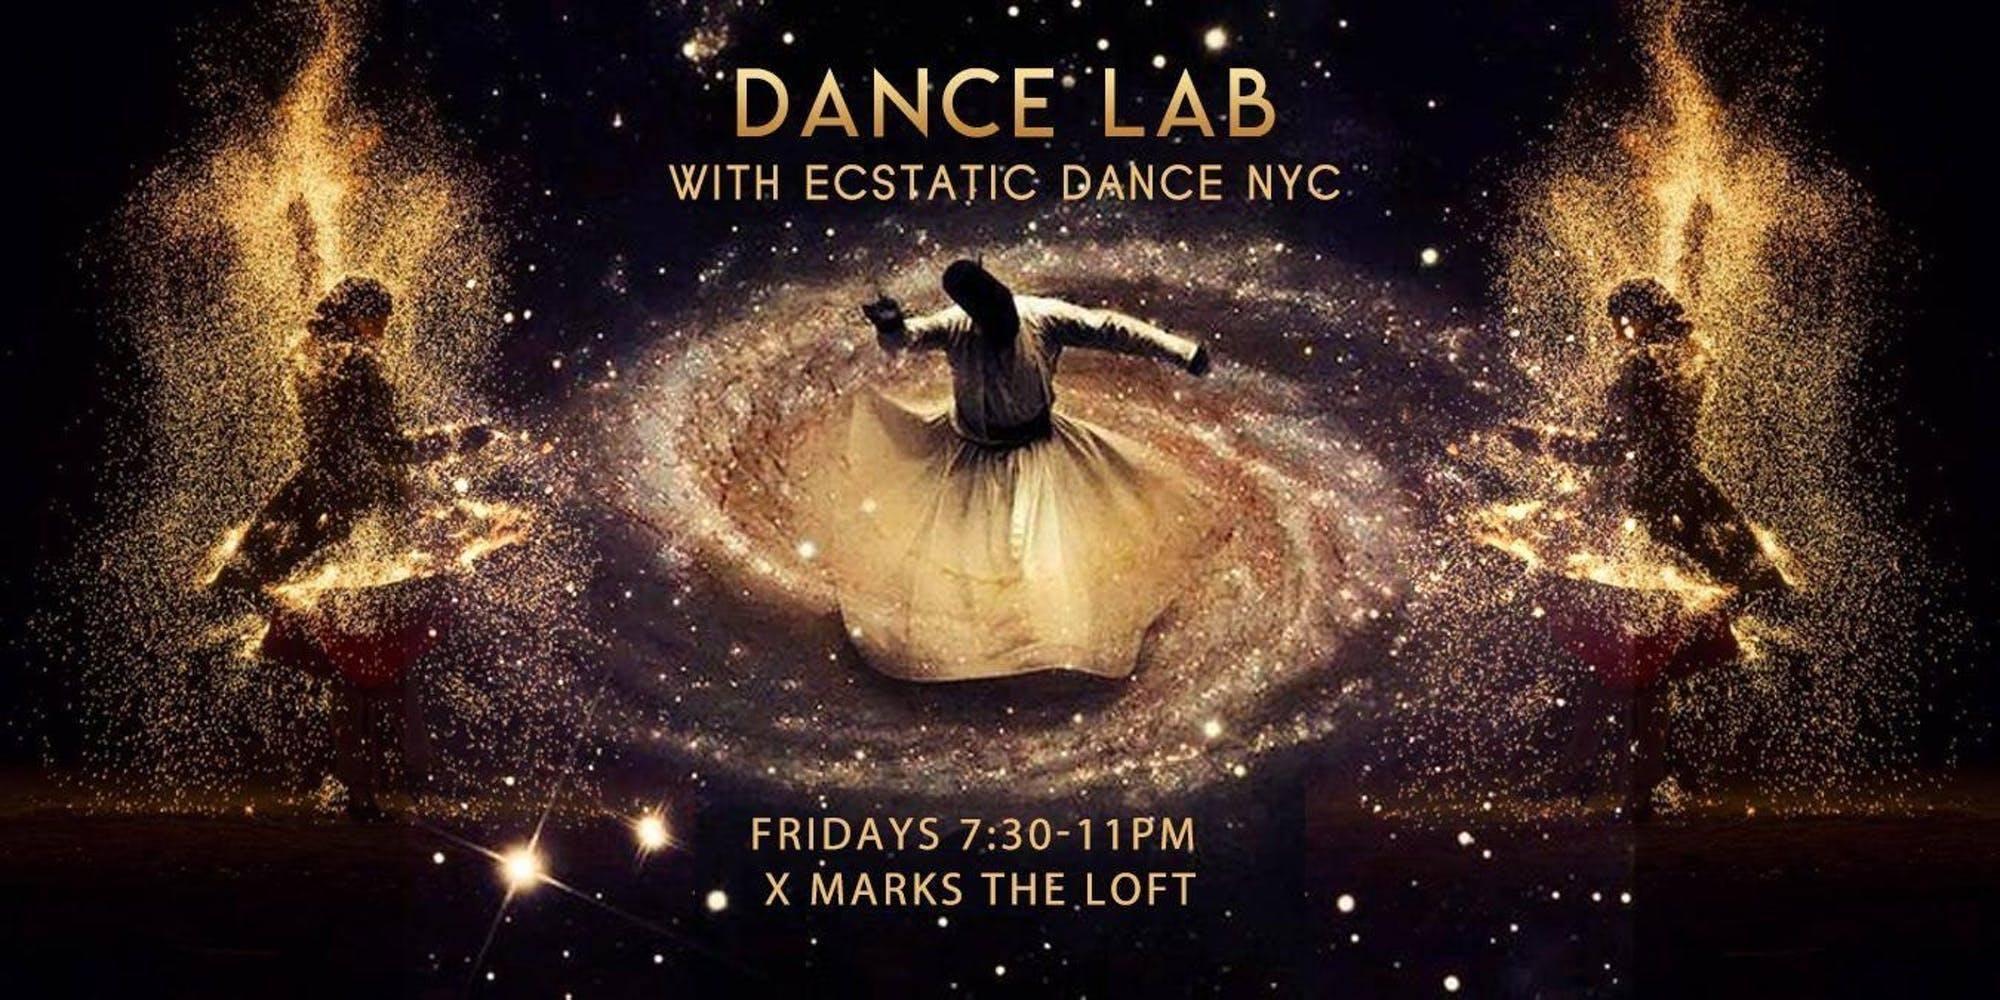 Dance_Lab_88_Ecstatic_Dance.jpg